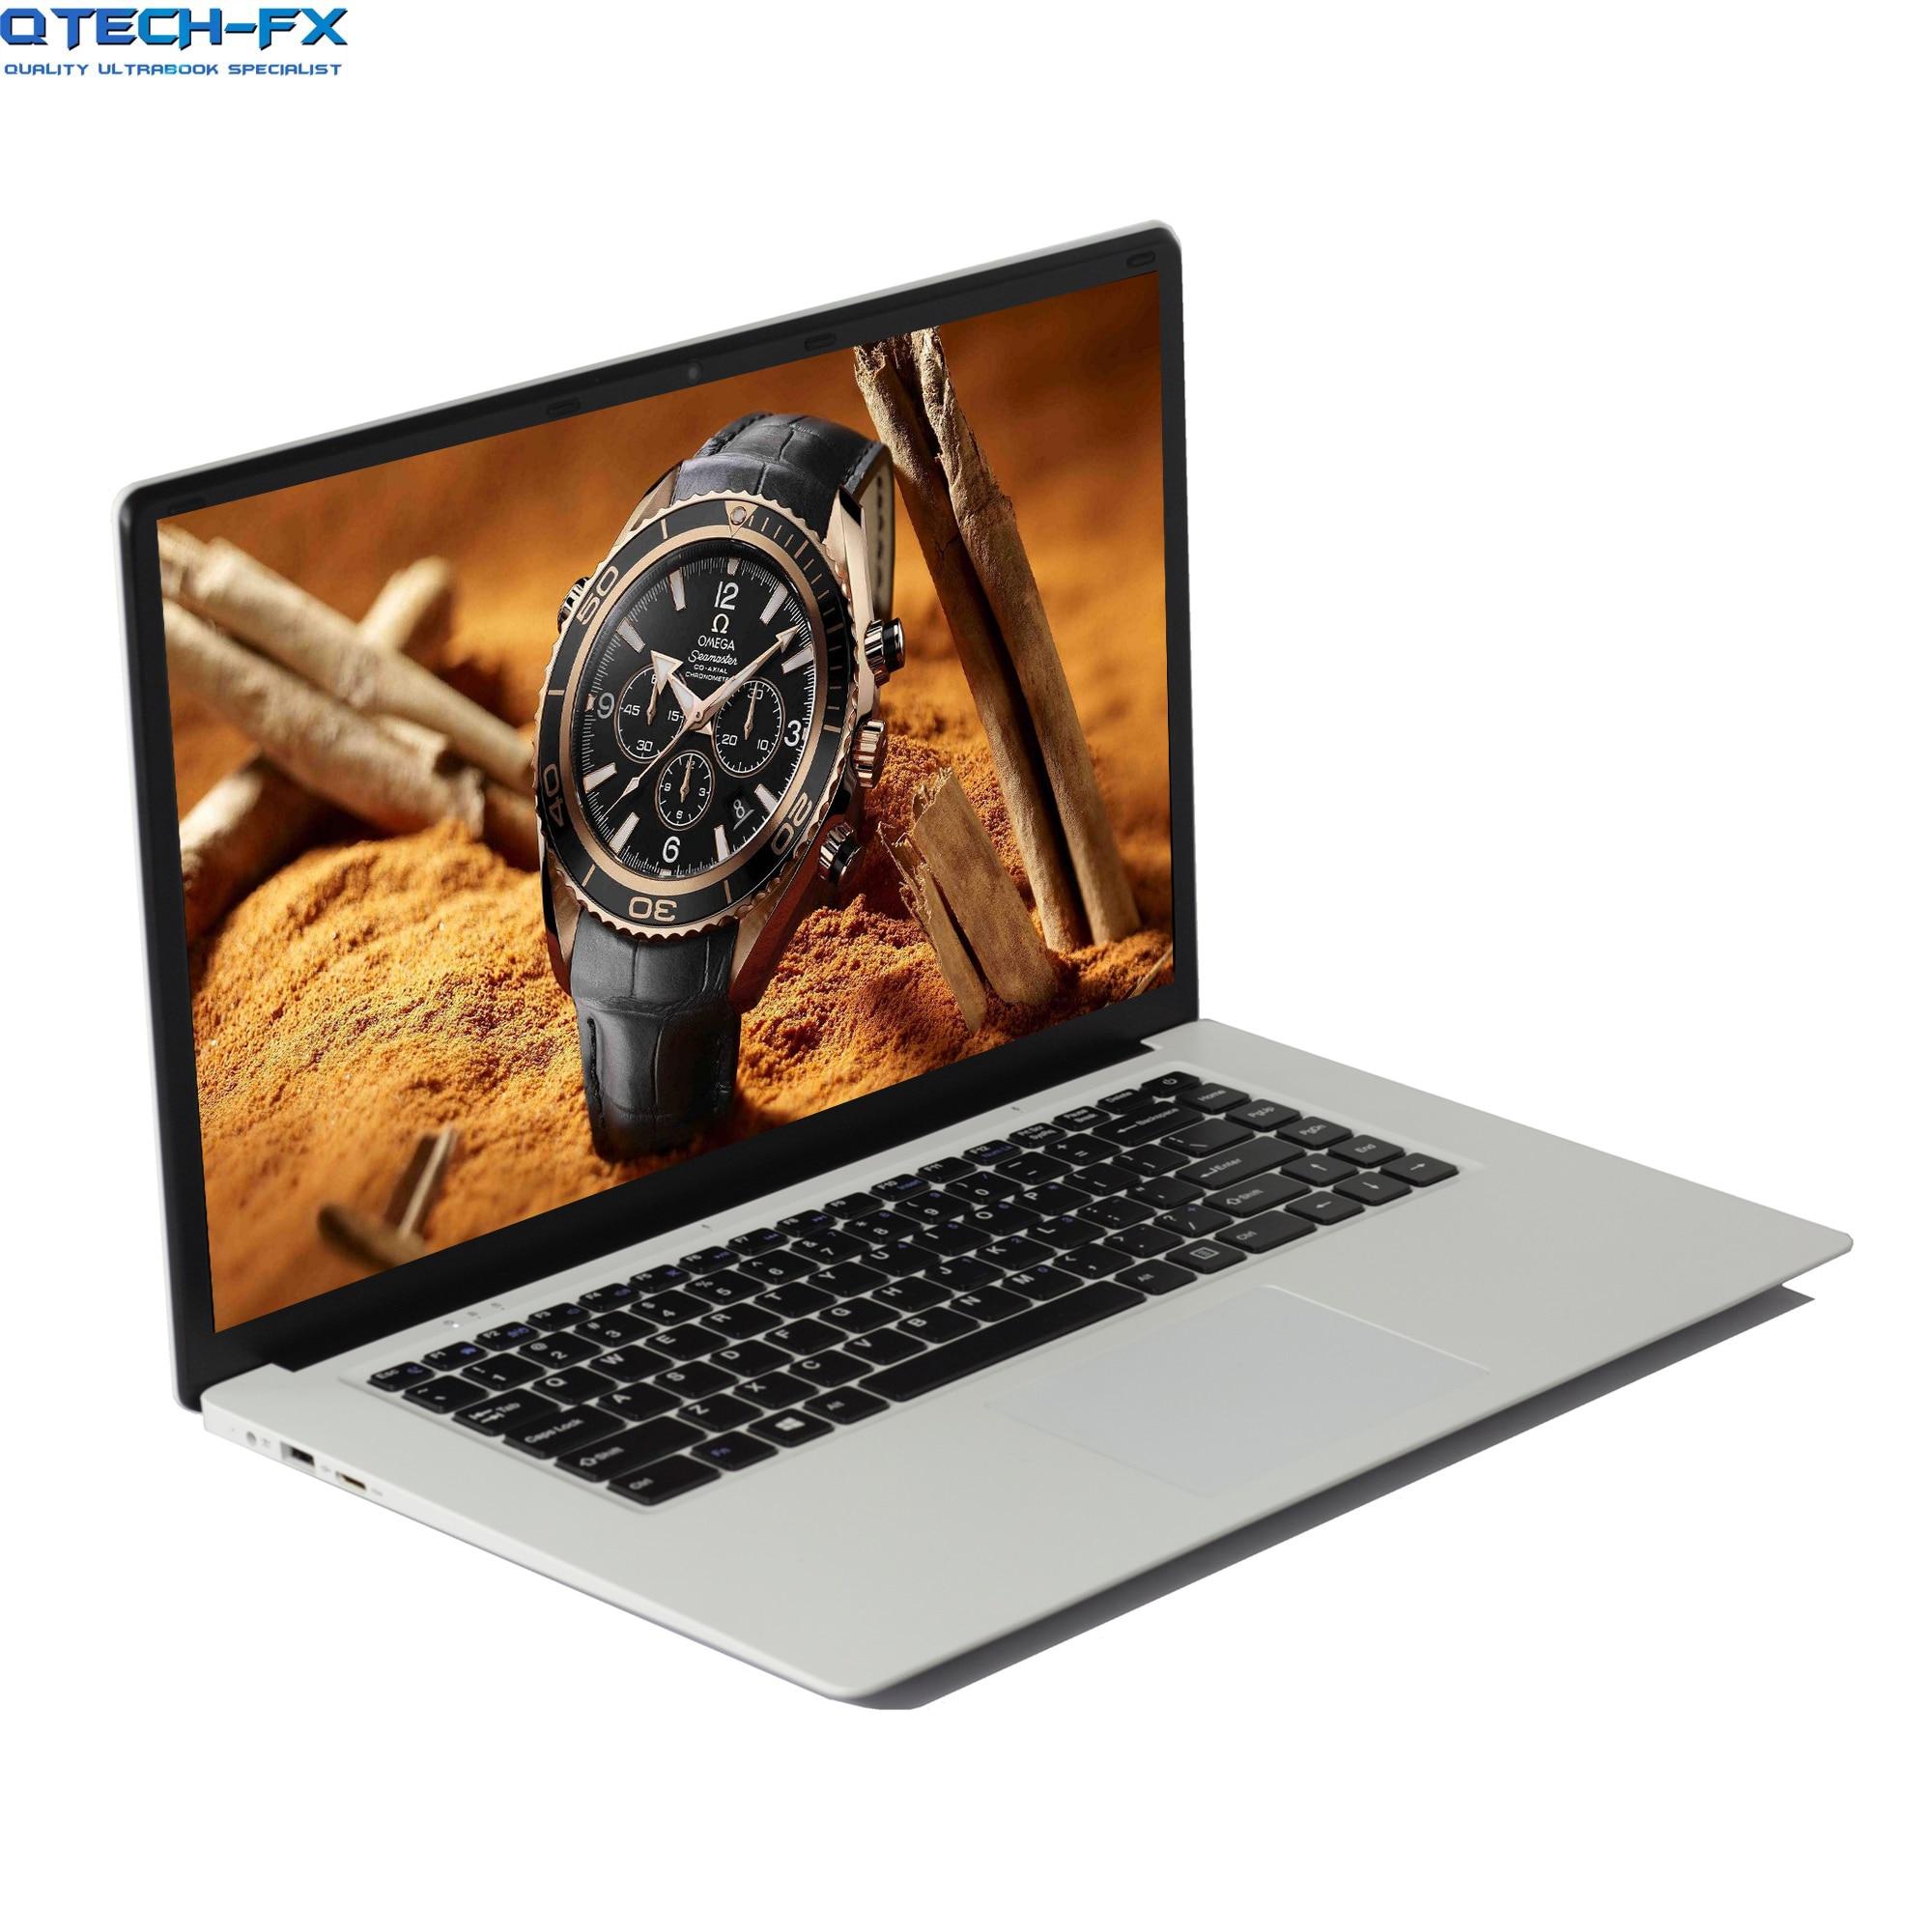 15,6 1920*1080 ультрабук SSD 480 ГБ/256/128 6 ГБ ОЗУ Windows 10 ноутбук процессор Intel Core арабский AZERTY Испанский Русский Клавиатура